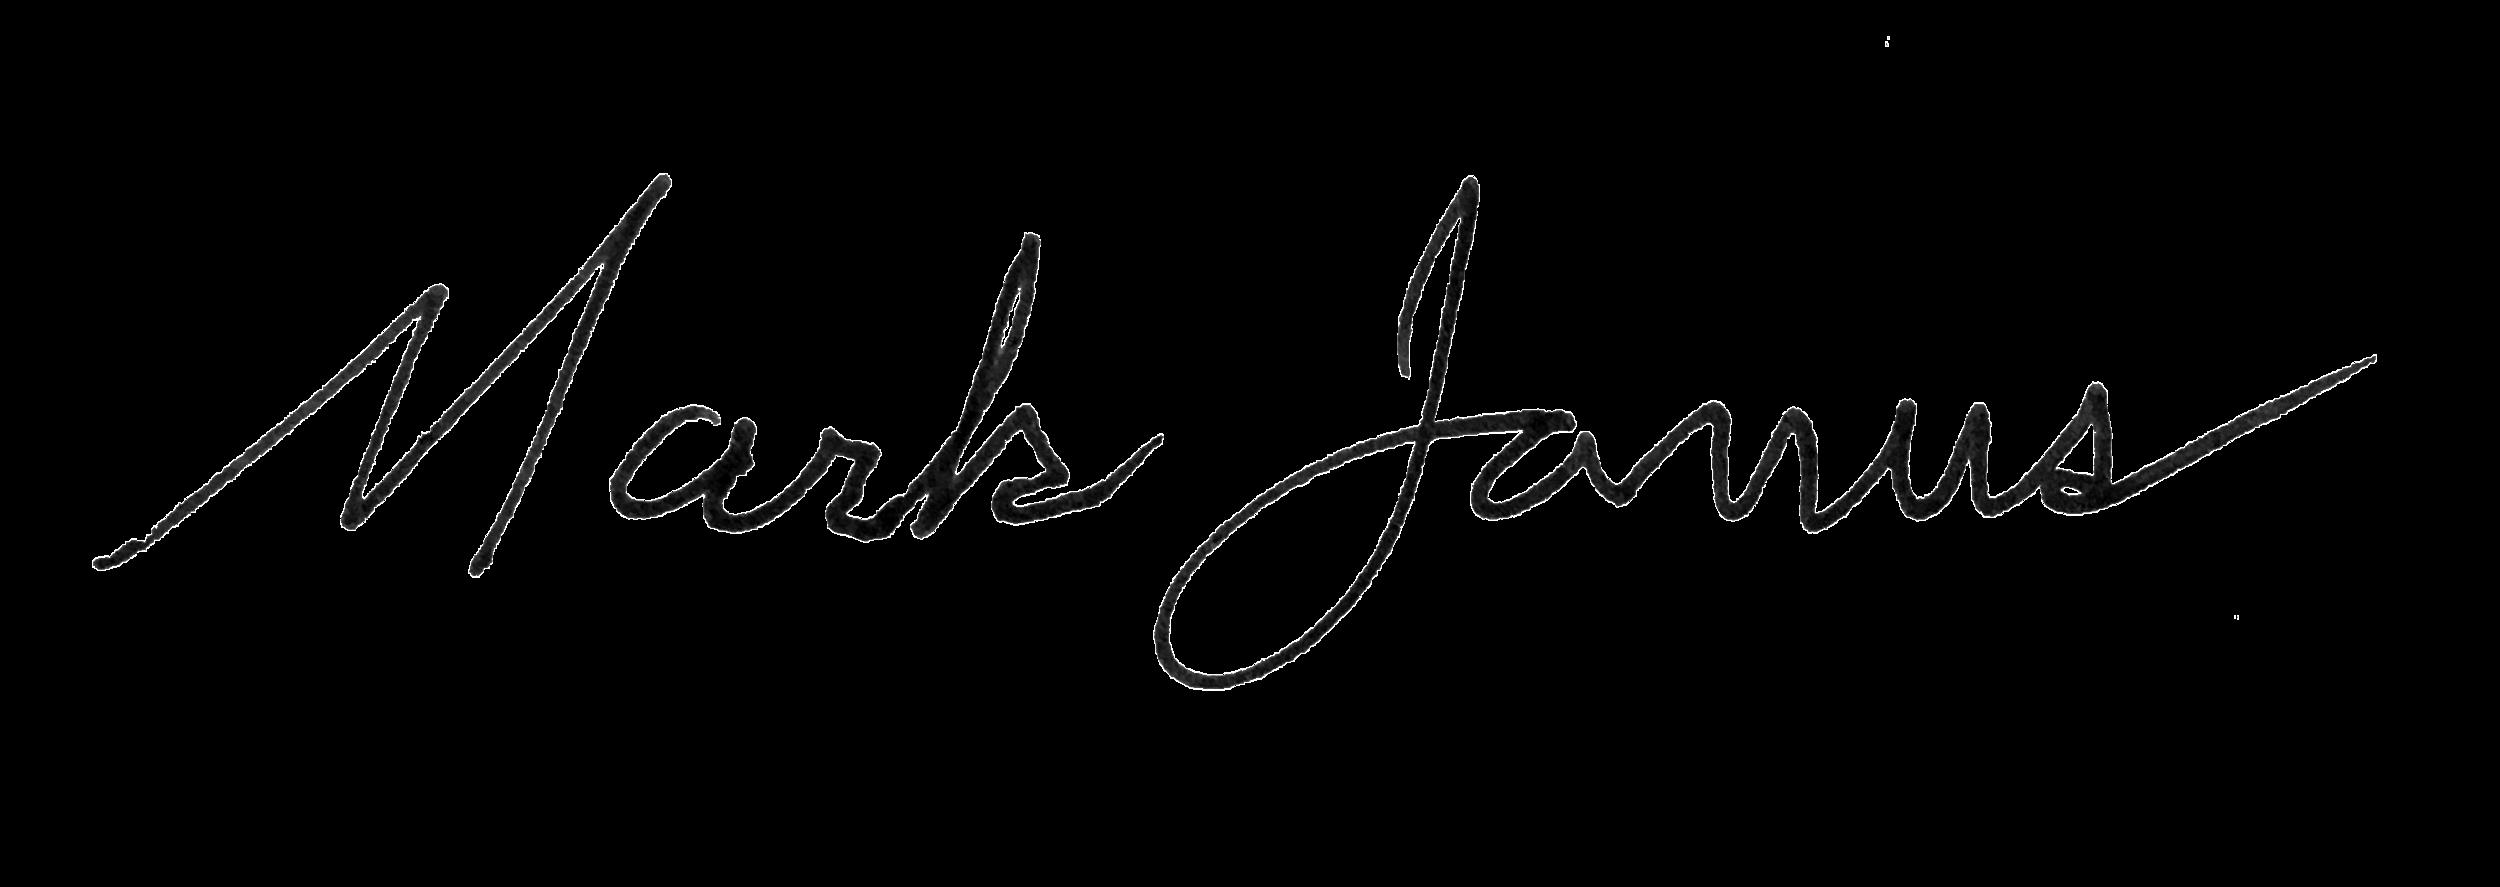 MJ Signature.png